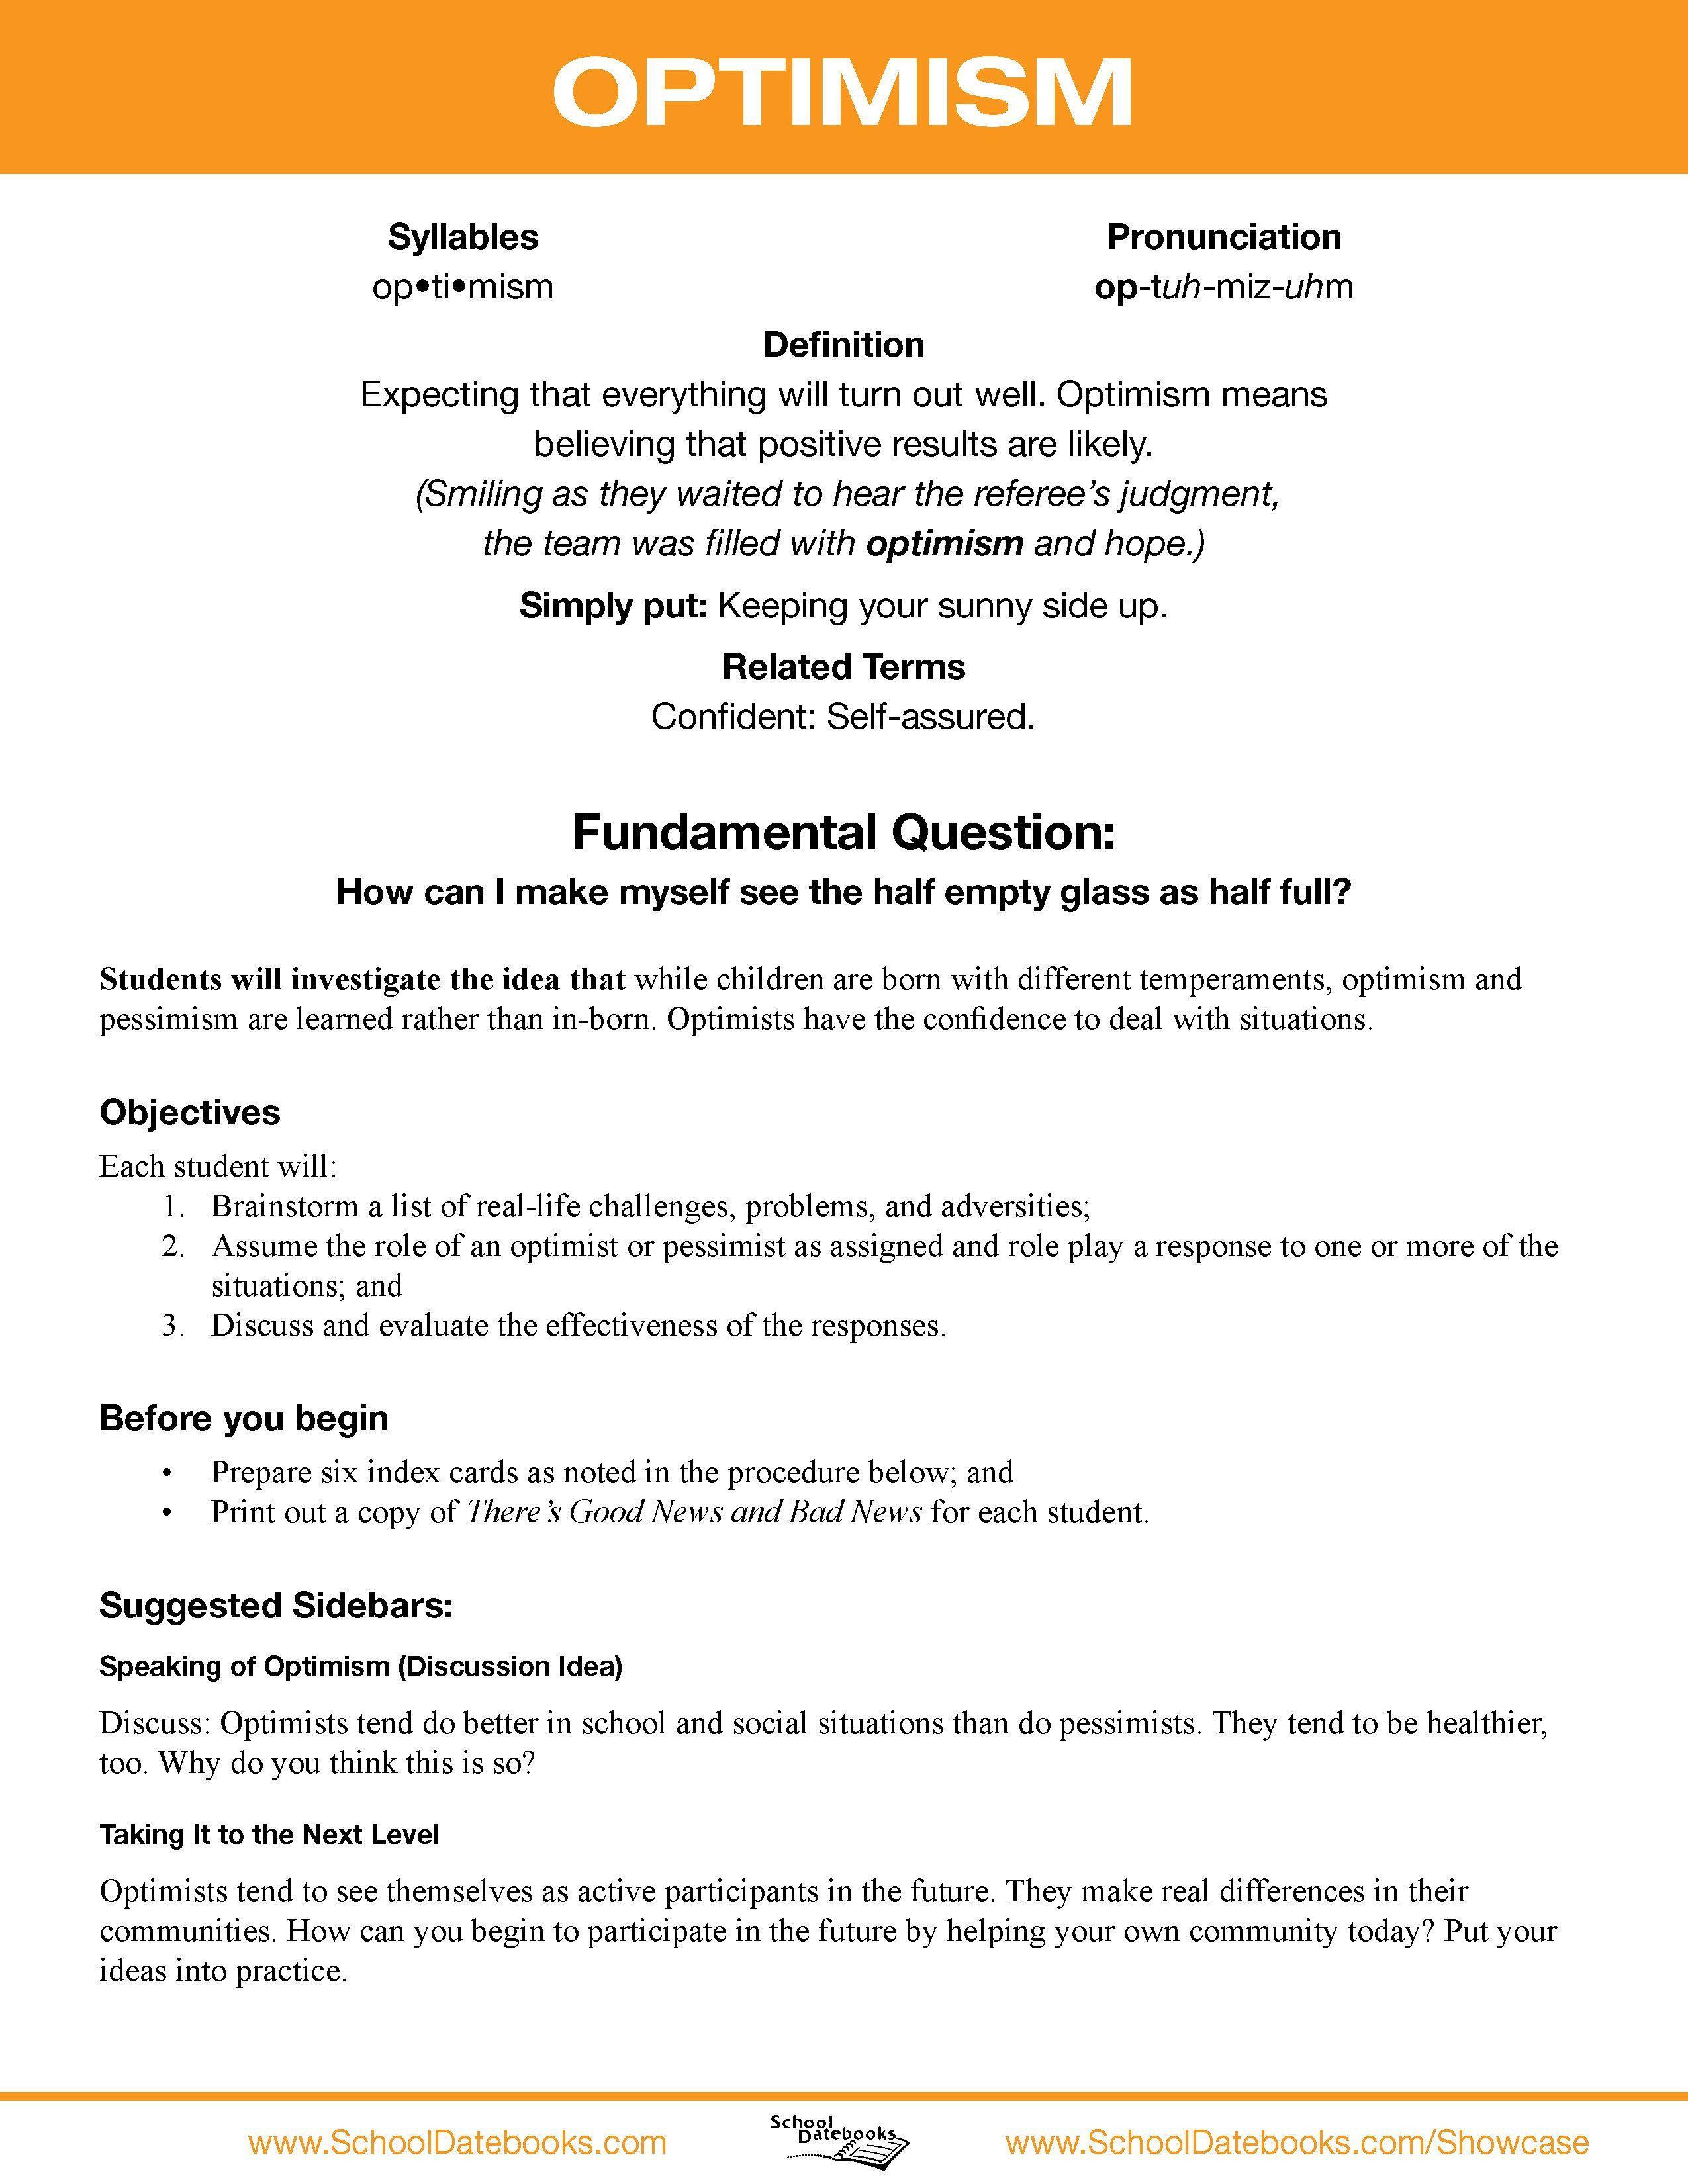 Linear Character Development Worksheet